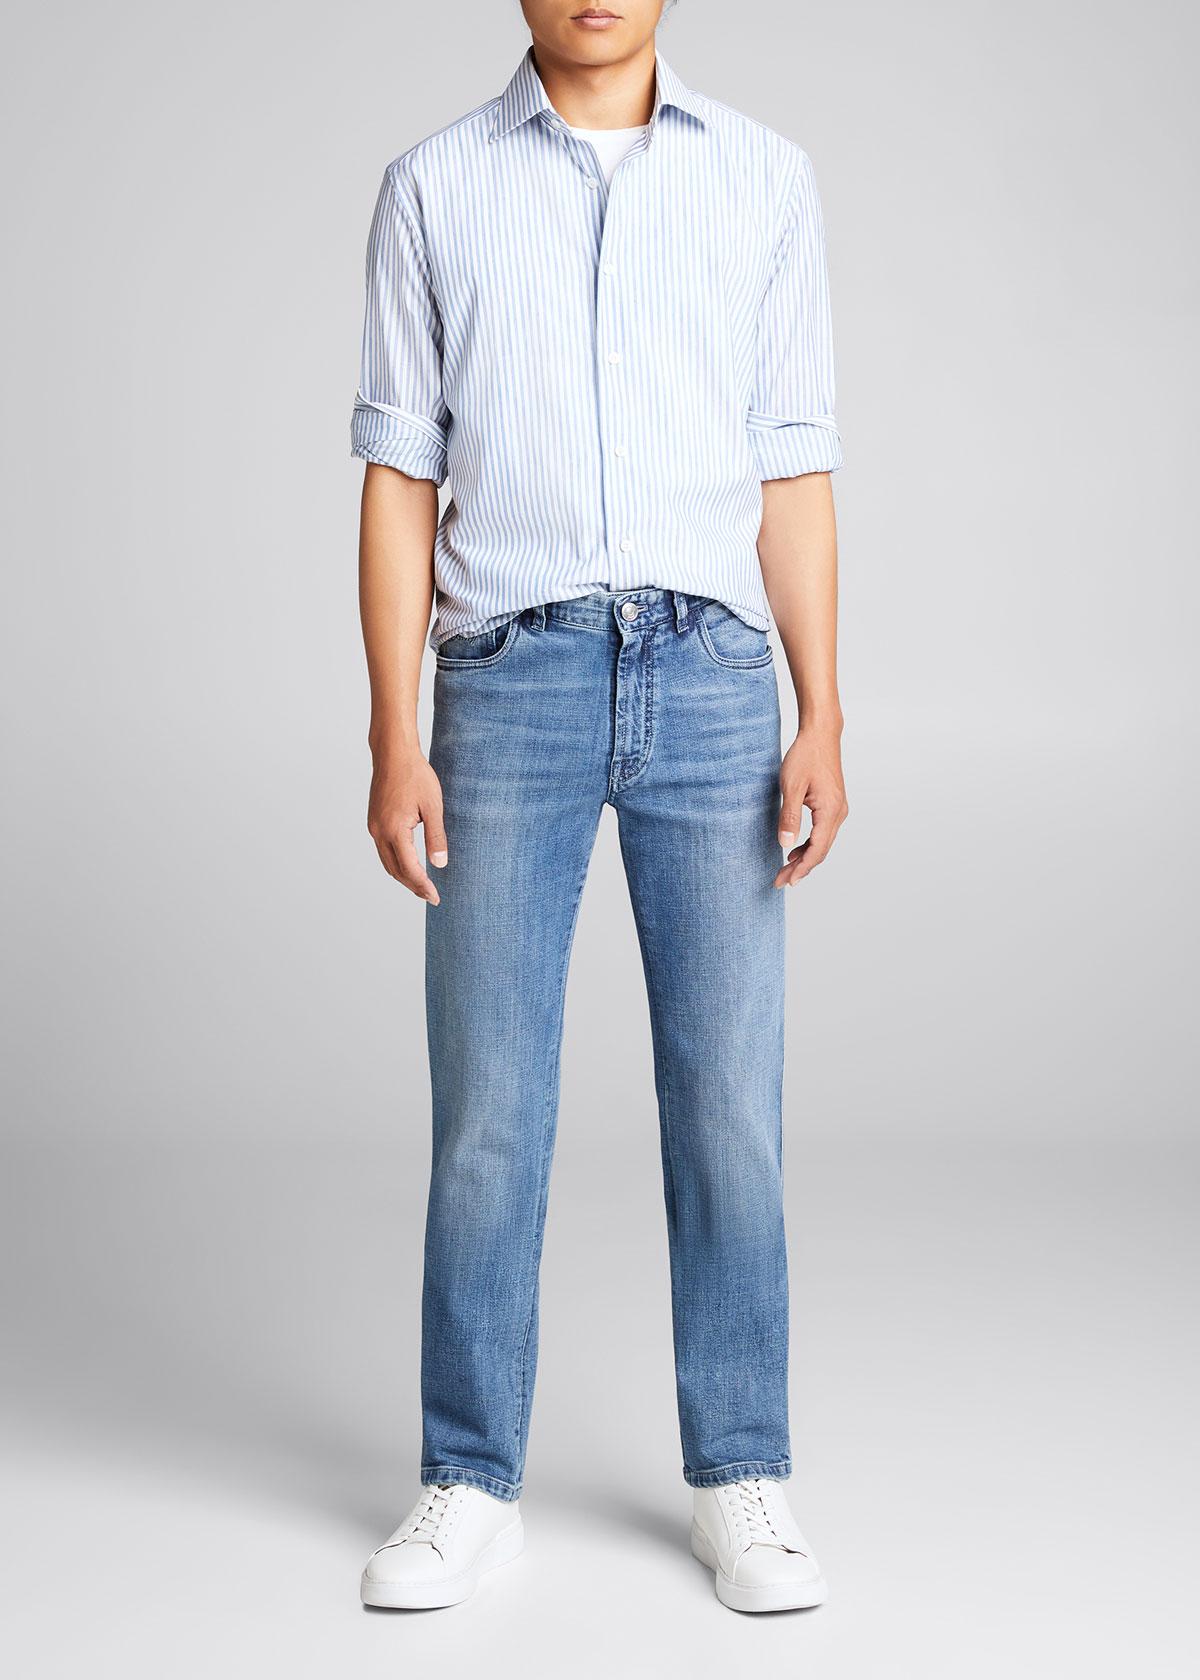 Brioni Jeans MEN'S MEDIUM-WASH STRAIGHT-LEG JEANS